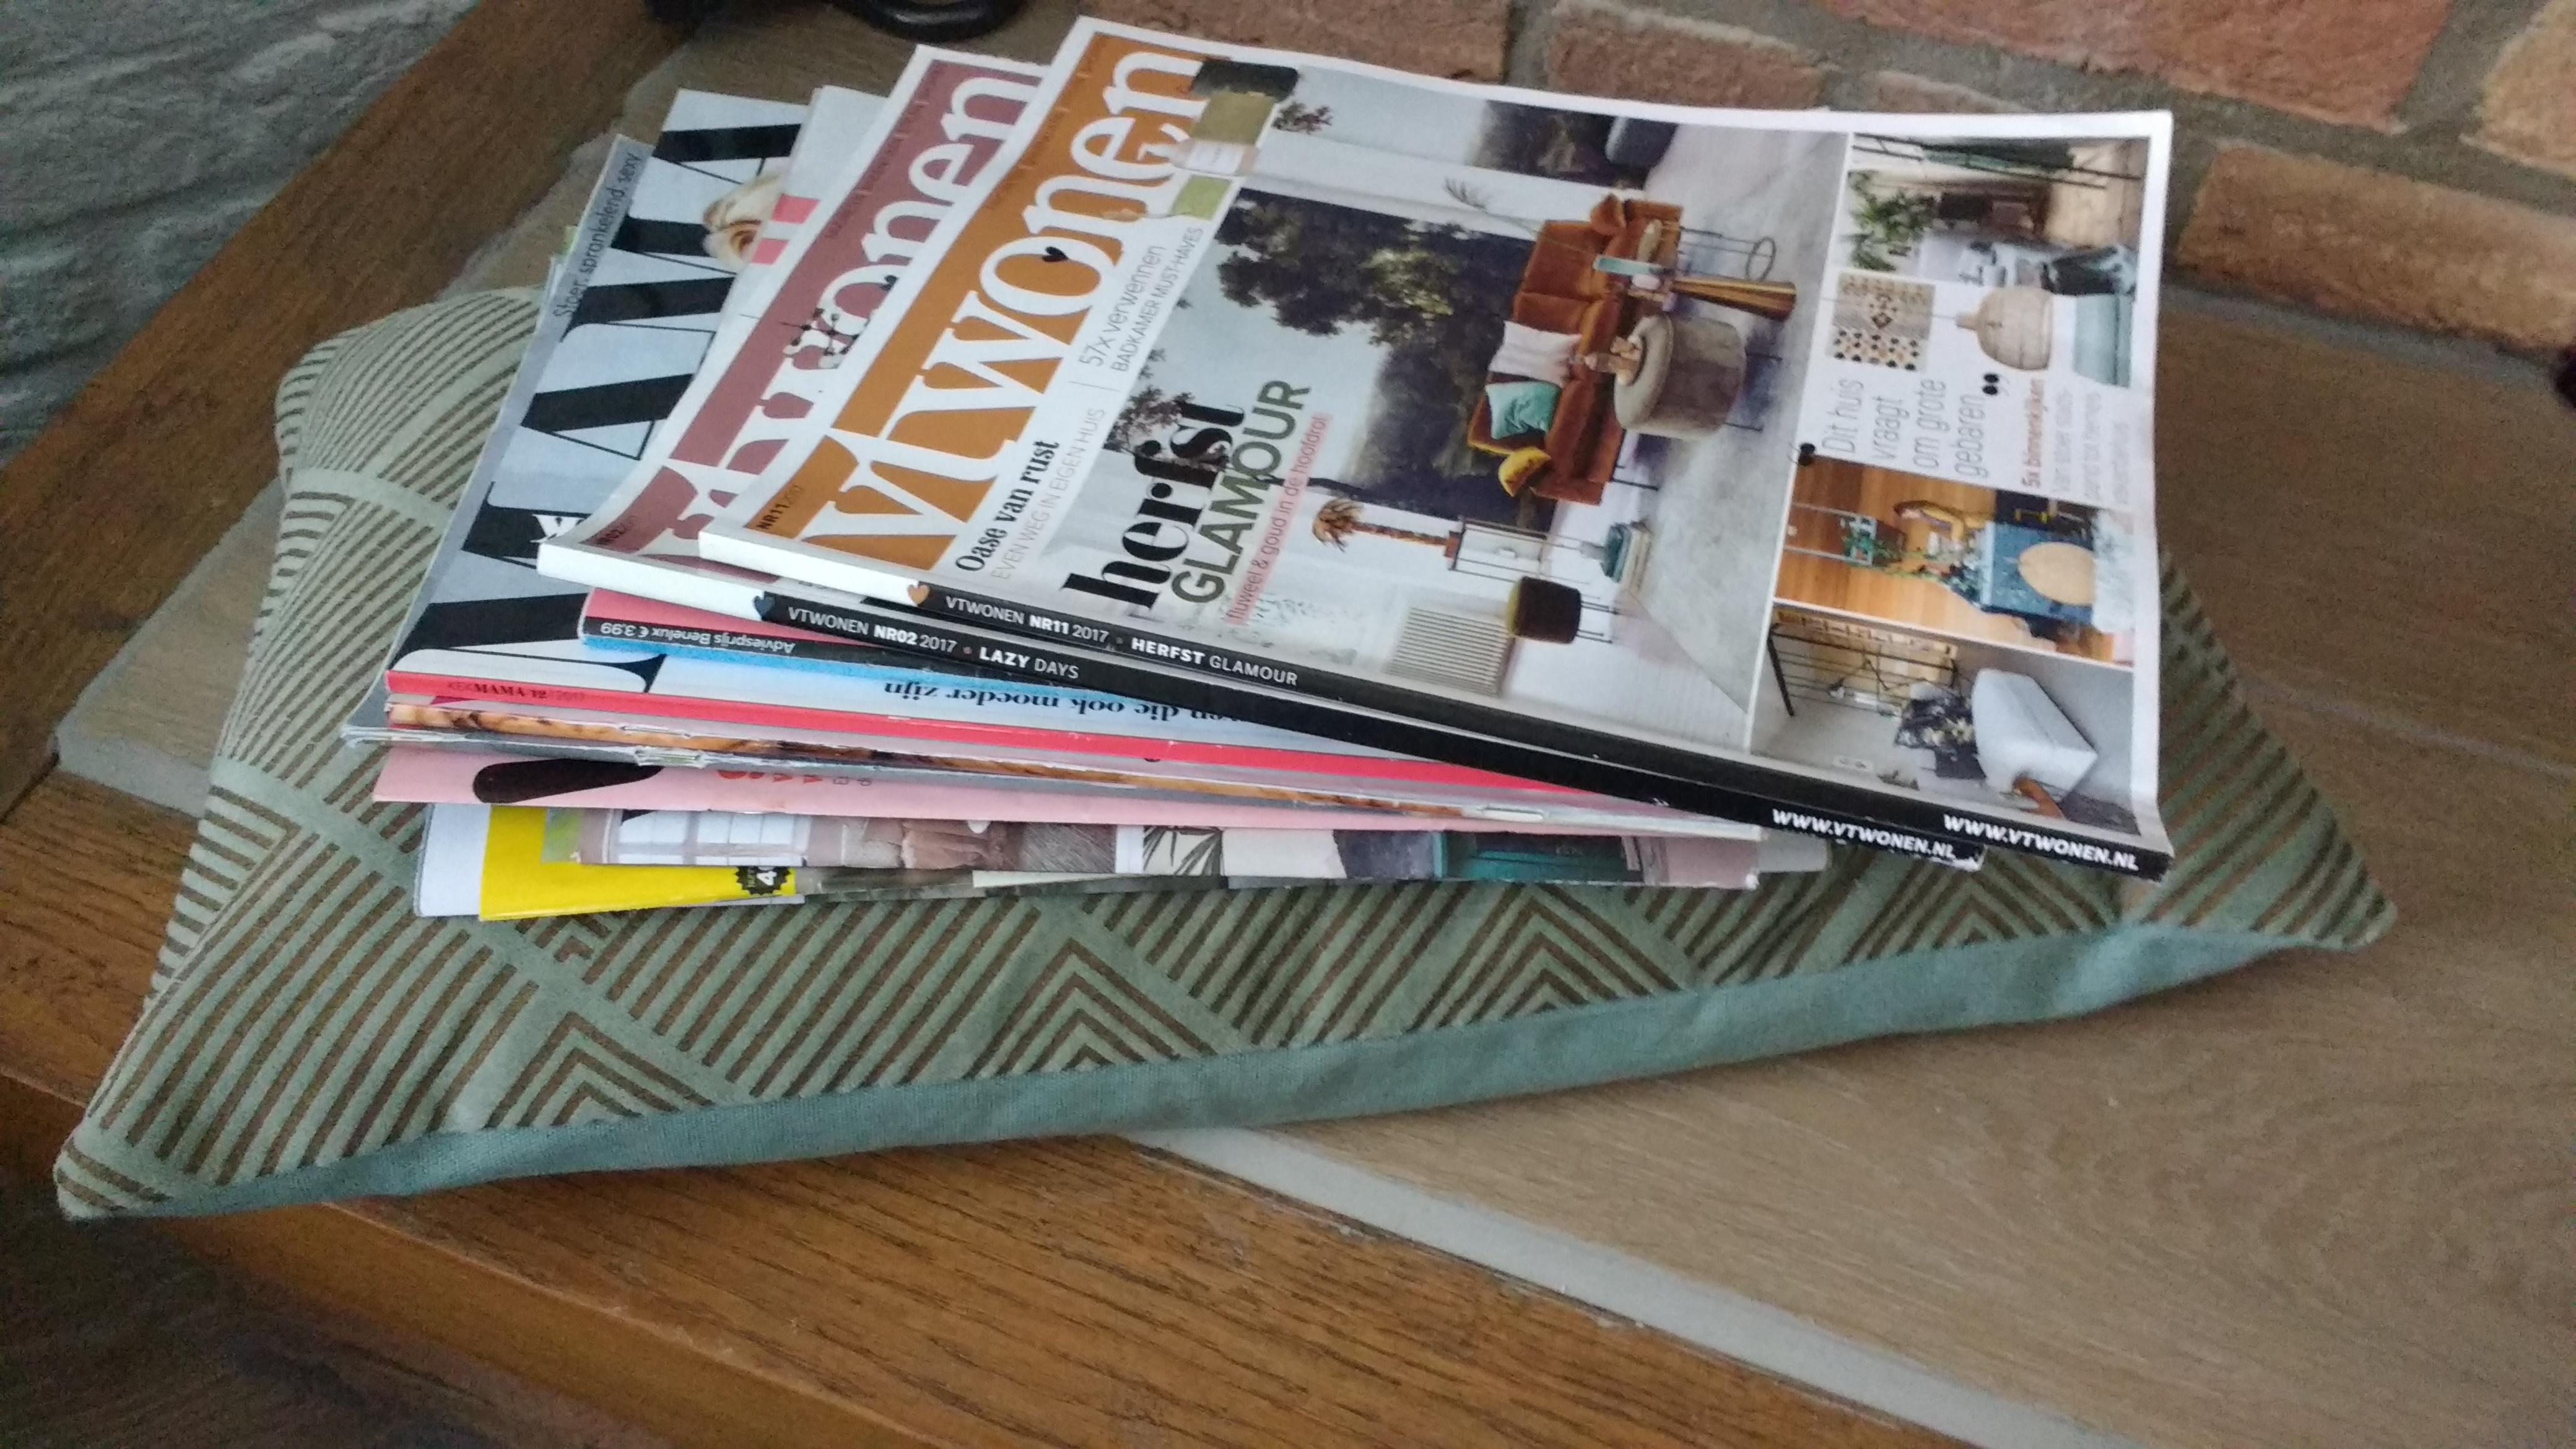 blij, happy, happy moments, liefde, hobby, gezin, lezen, schrijven, blog, mamablog, mamalifestyle blog, interieur, La Log.nl